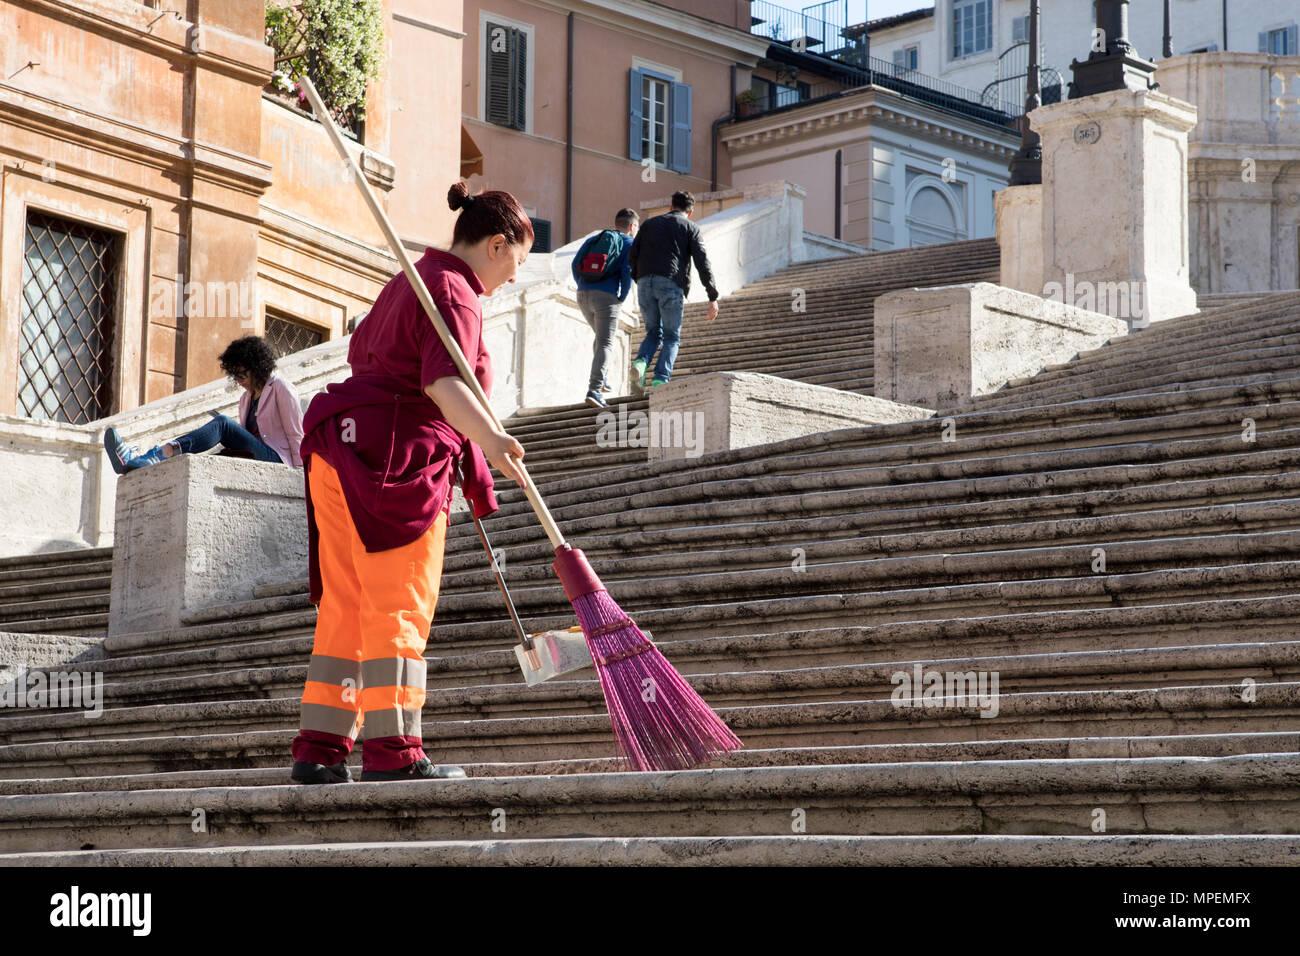 Rome Trinita de Monti, Municipal clean up worker woman  AMA cleaning Spanish  steps. - Stock Image